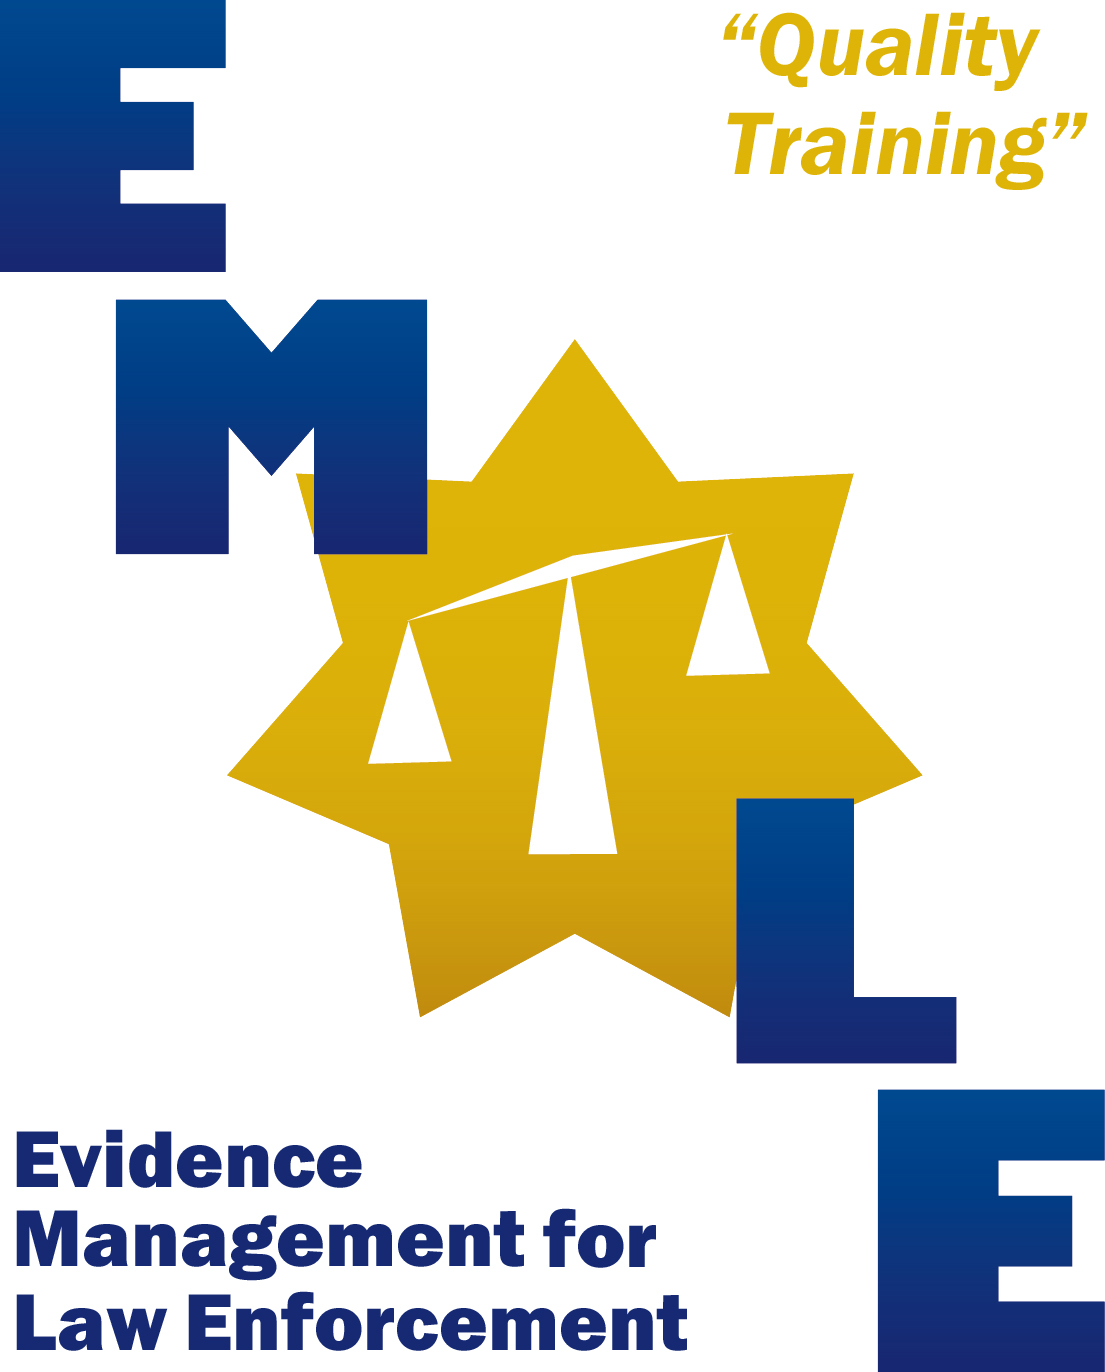 Evidence Management for Law Enforcement